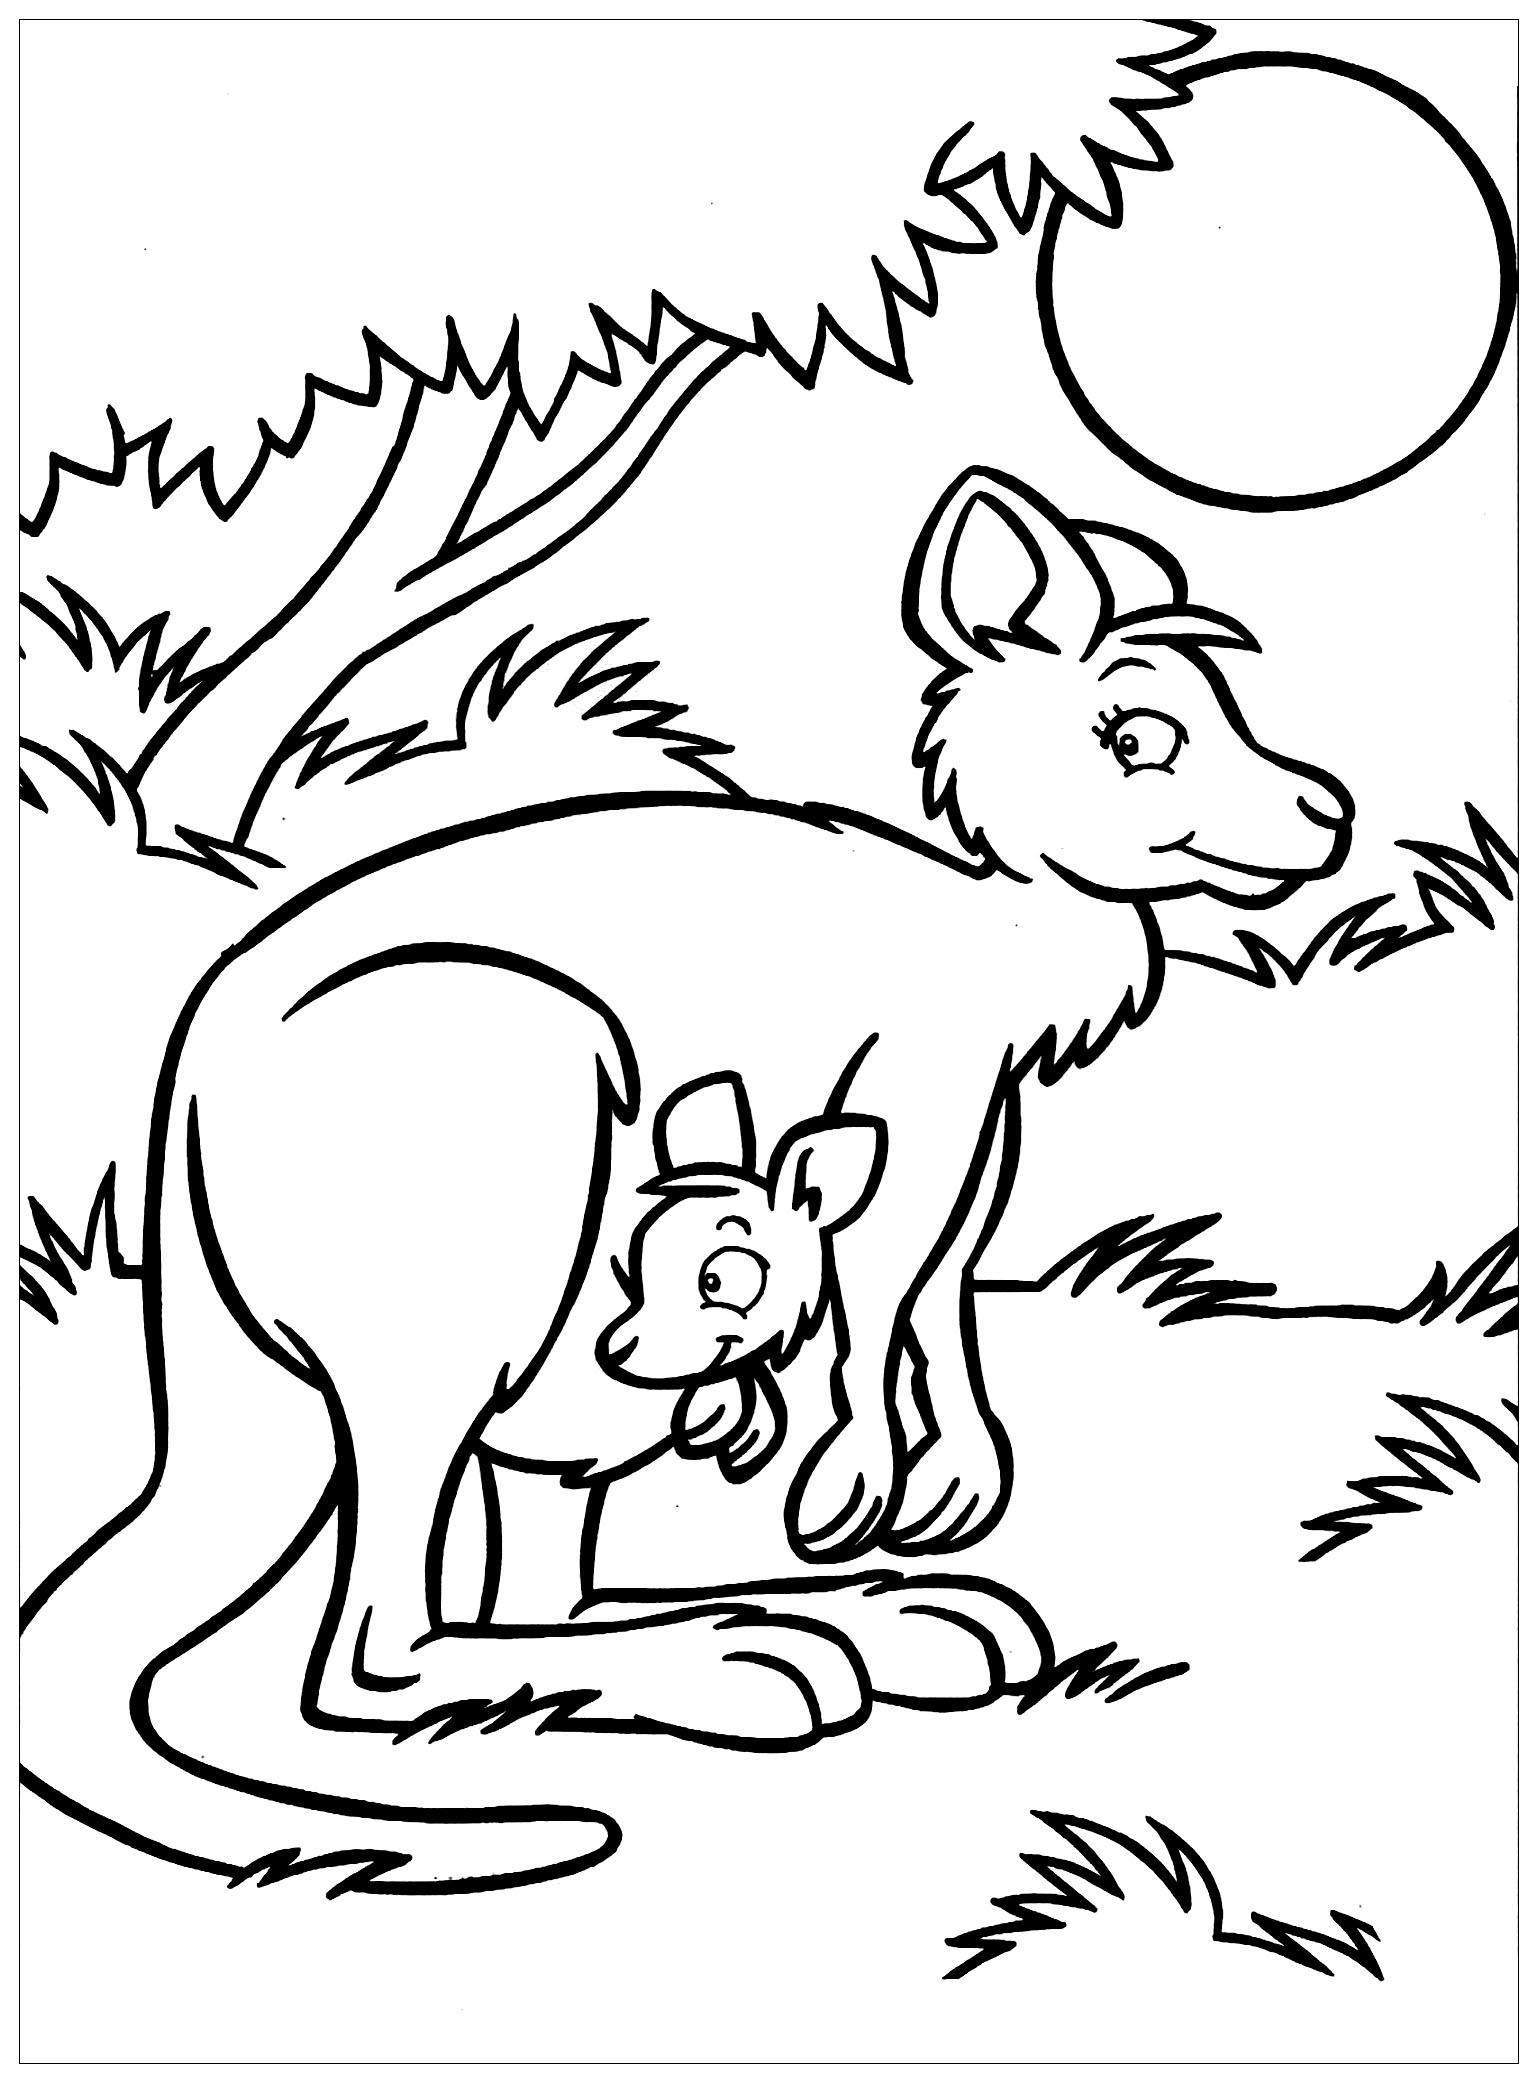 Funny Kangaroos coloring page